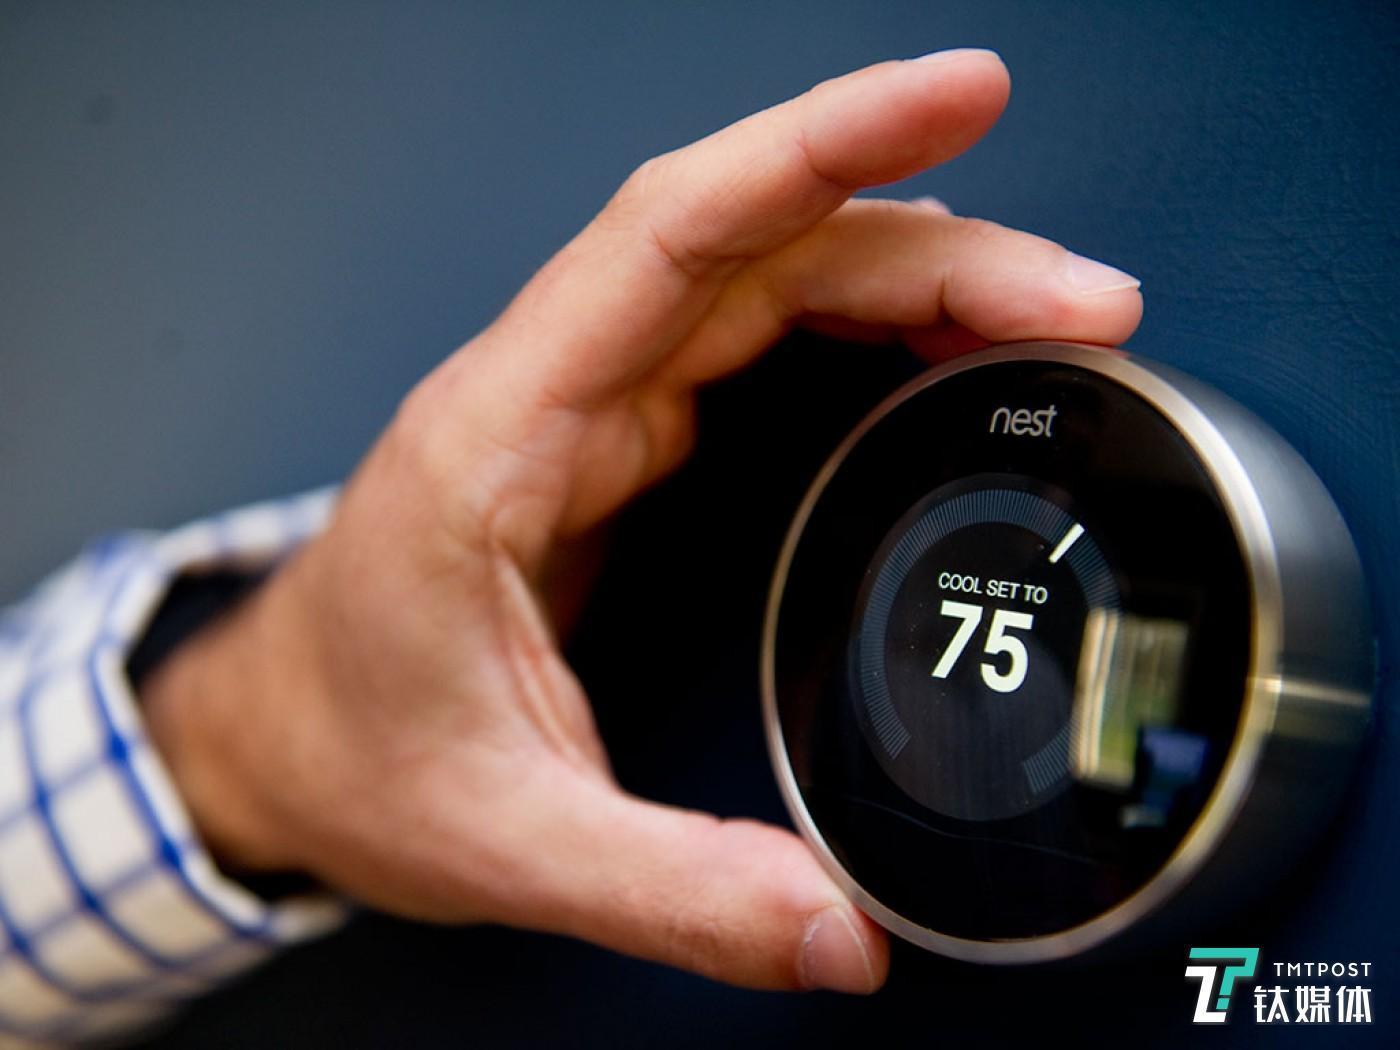 Google 曾经试图借助 Nest Labs 抢占智能家居市场的先机